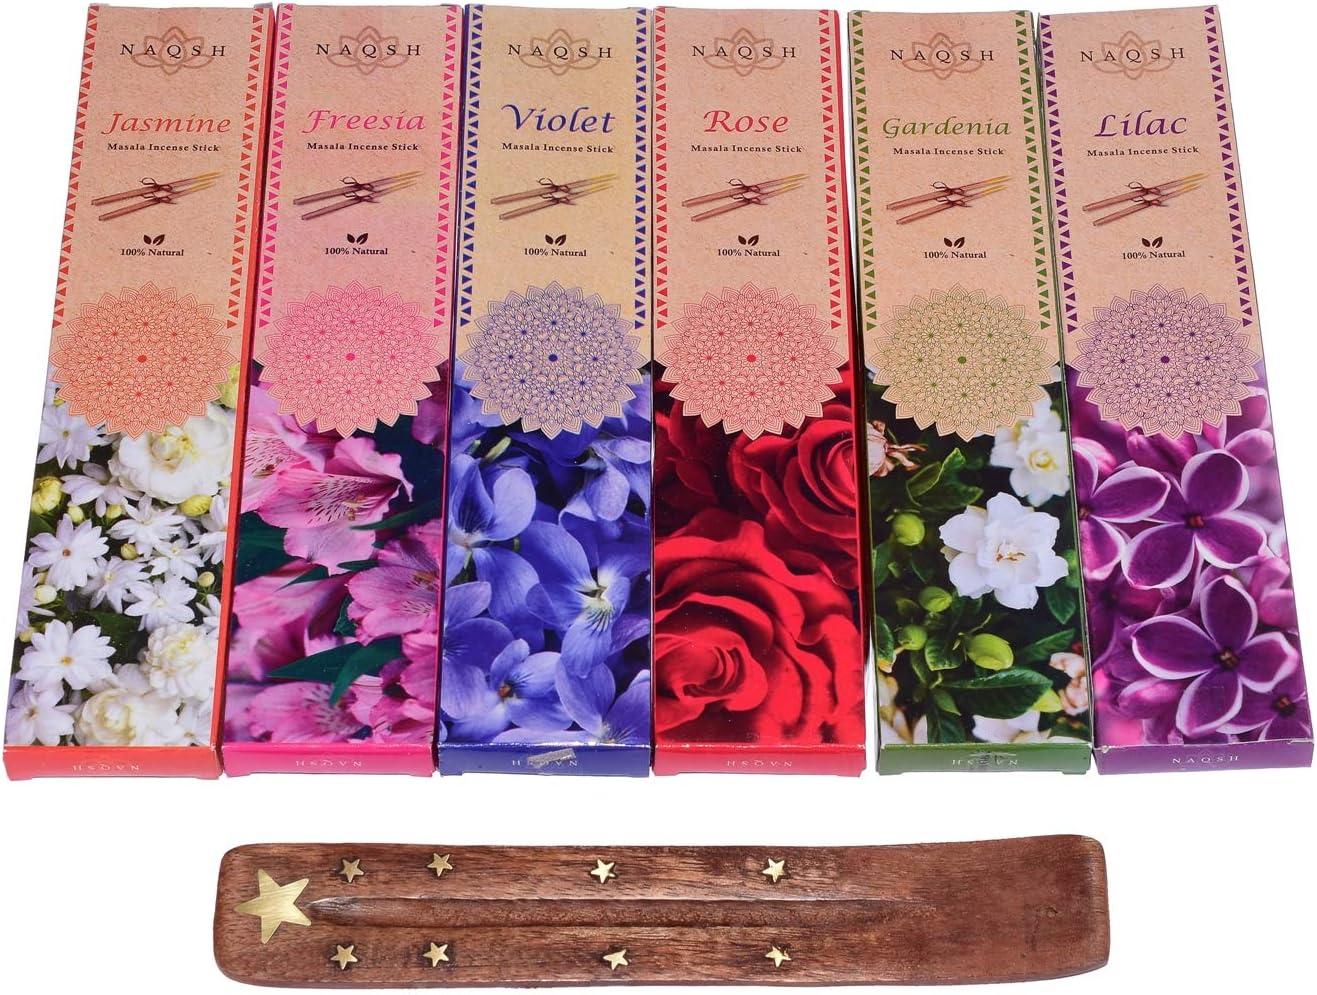 NAQSH Premium Hand Rolled Incense- Assorted 6x20 Exquisite Flowery Aura Incense Sticks Including Violet, Rose, Jasmine, Freesia, Lilac, and Gardenia